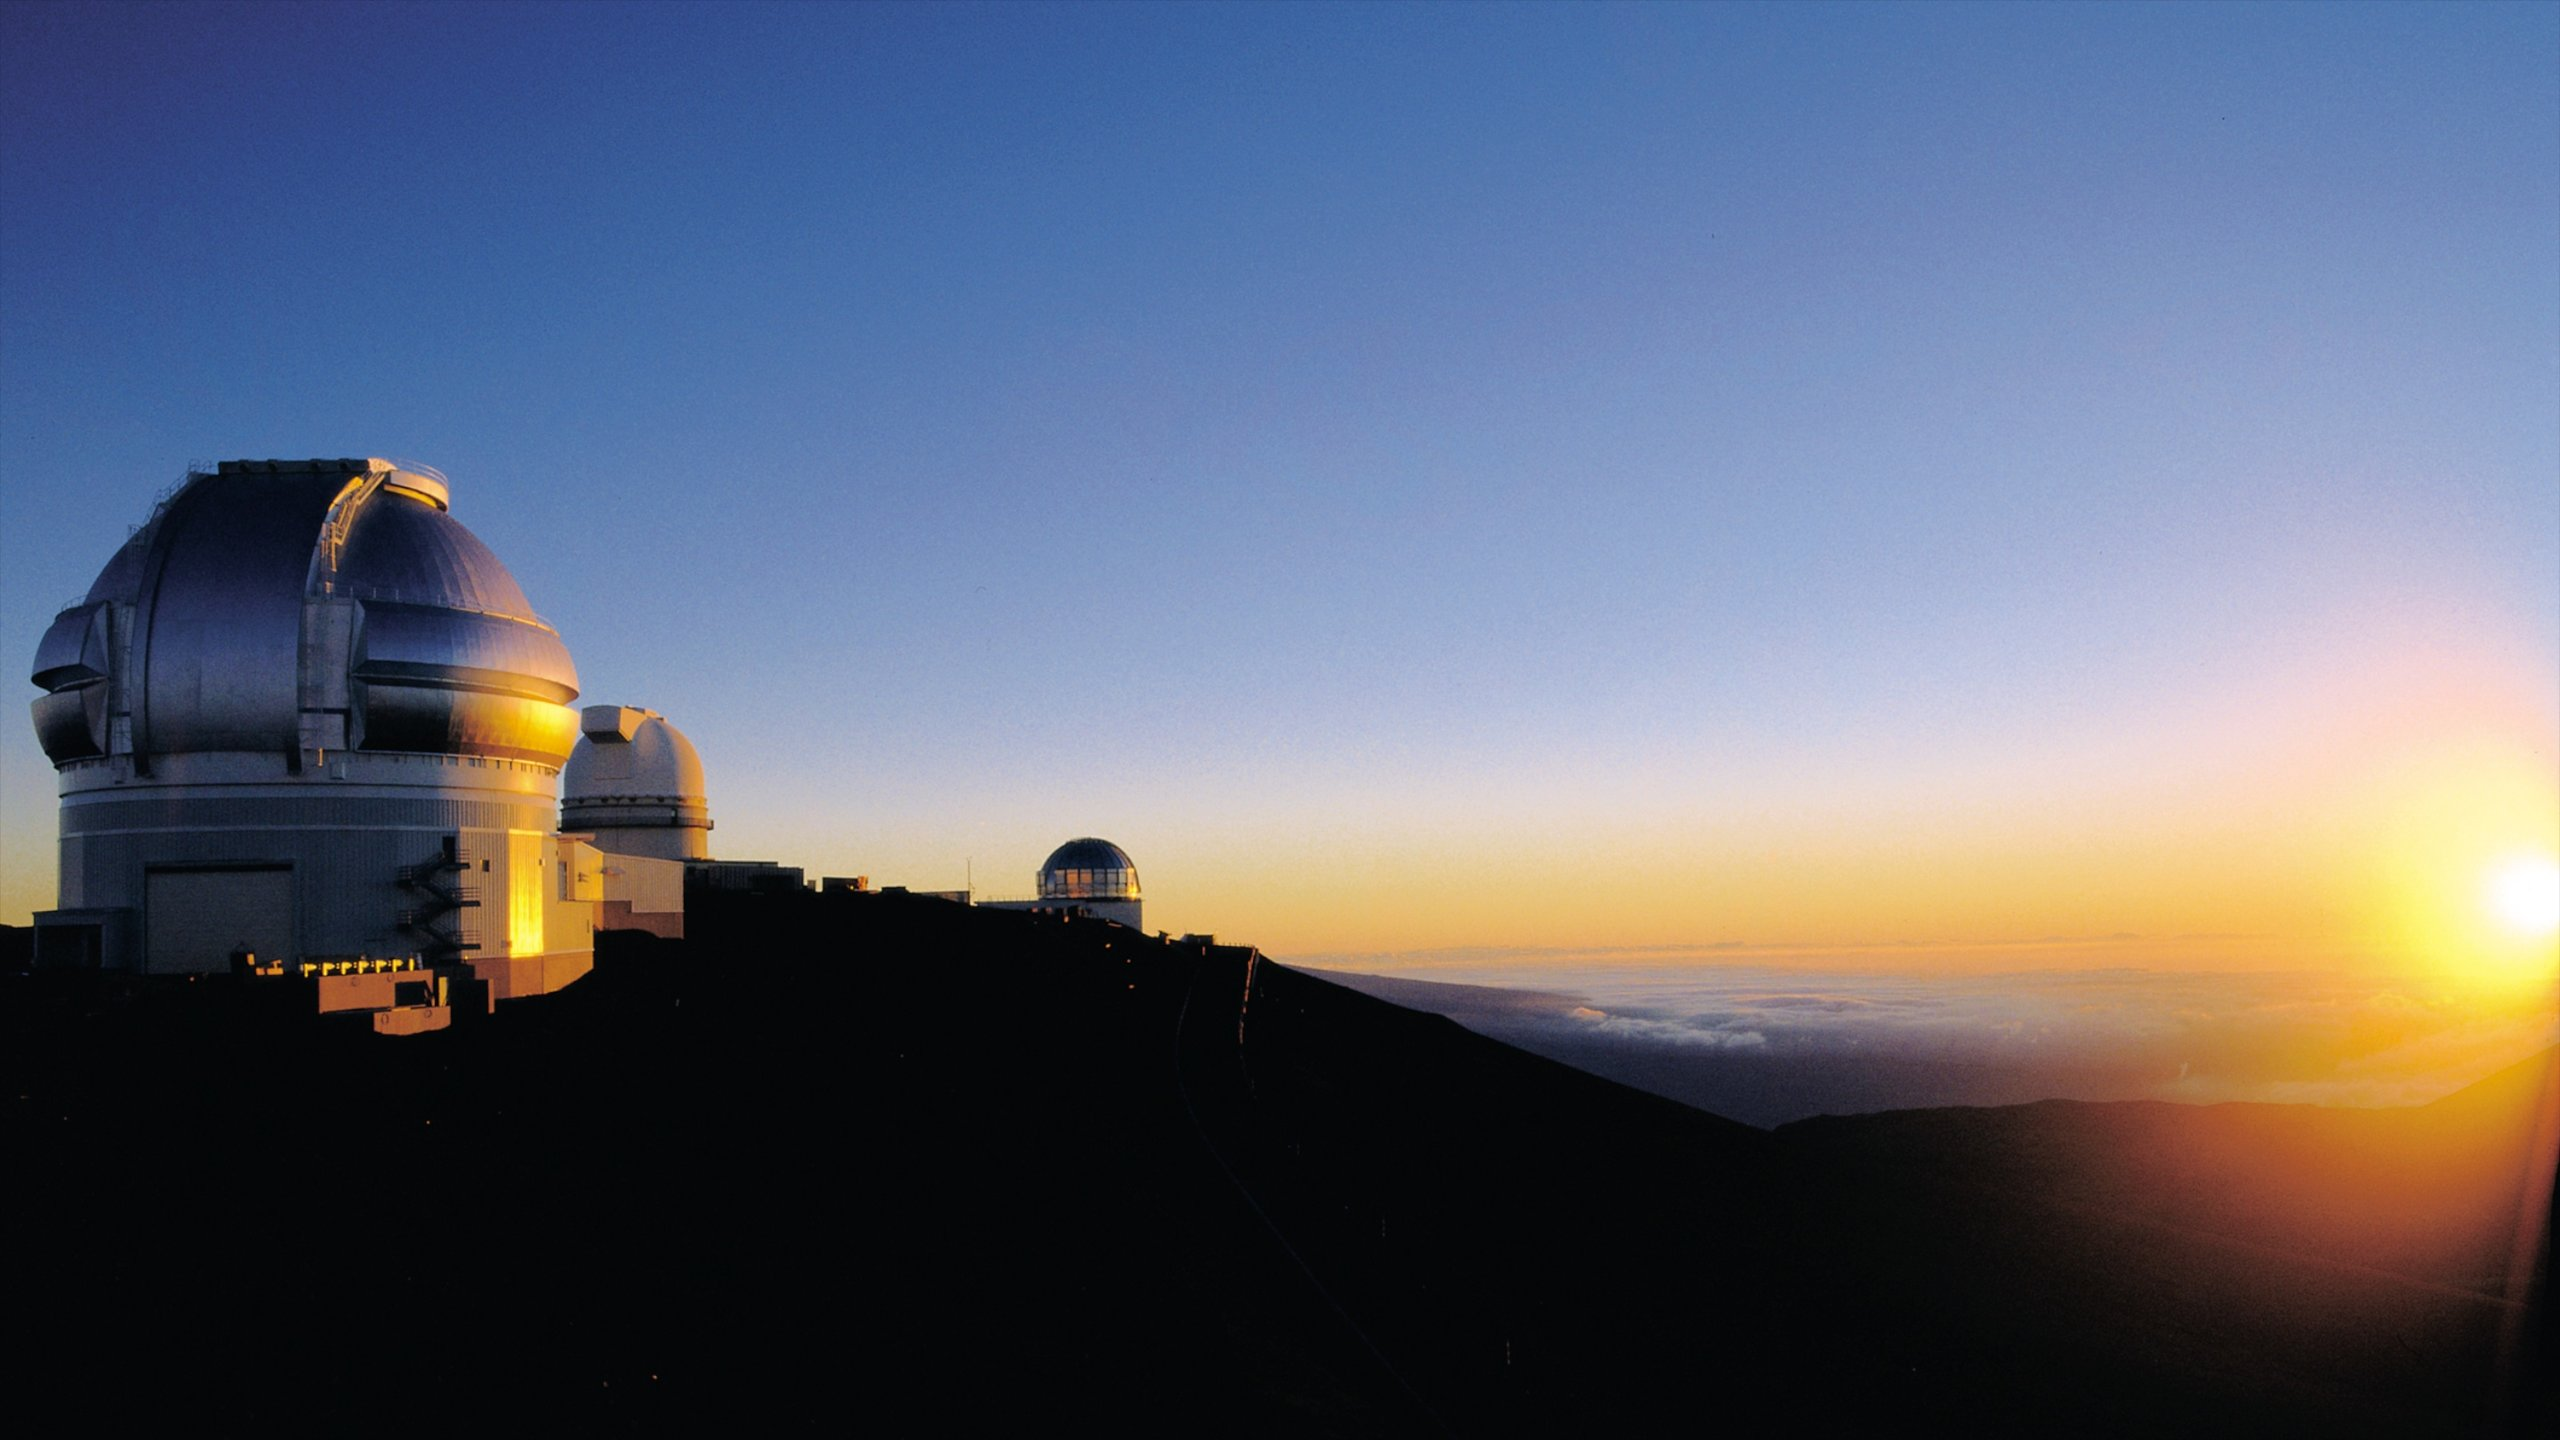 10 Best Hotels Closest to Kitt Peak National Observatory in